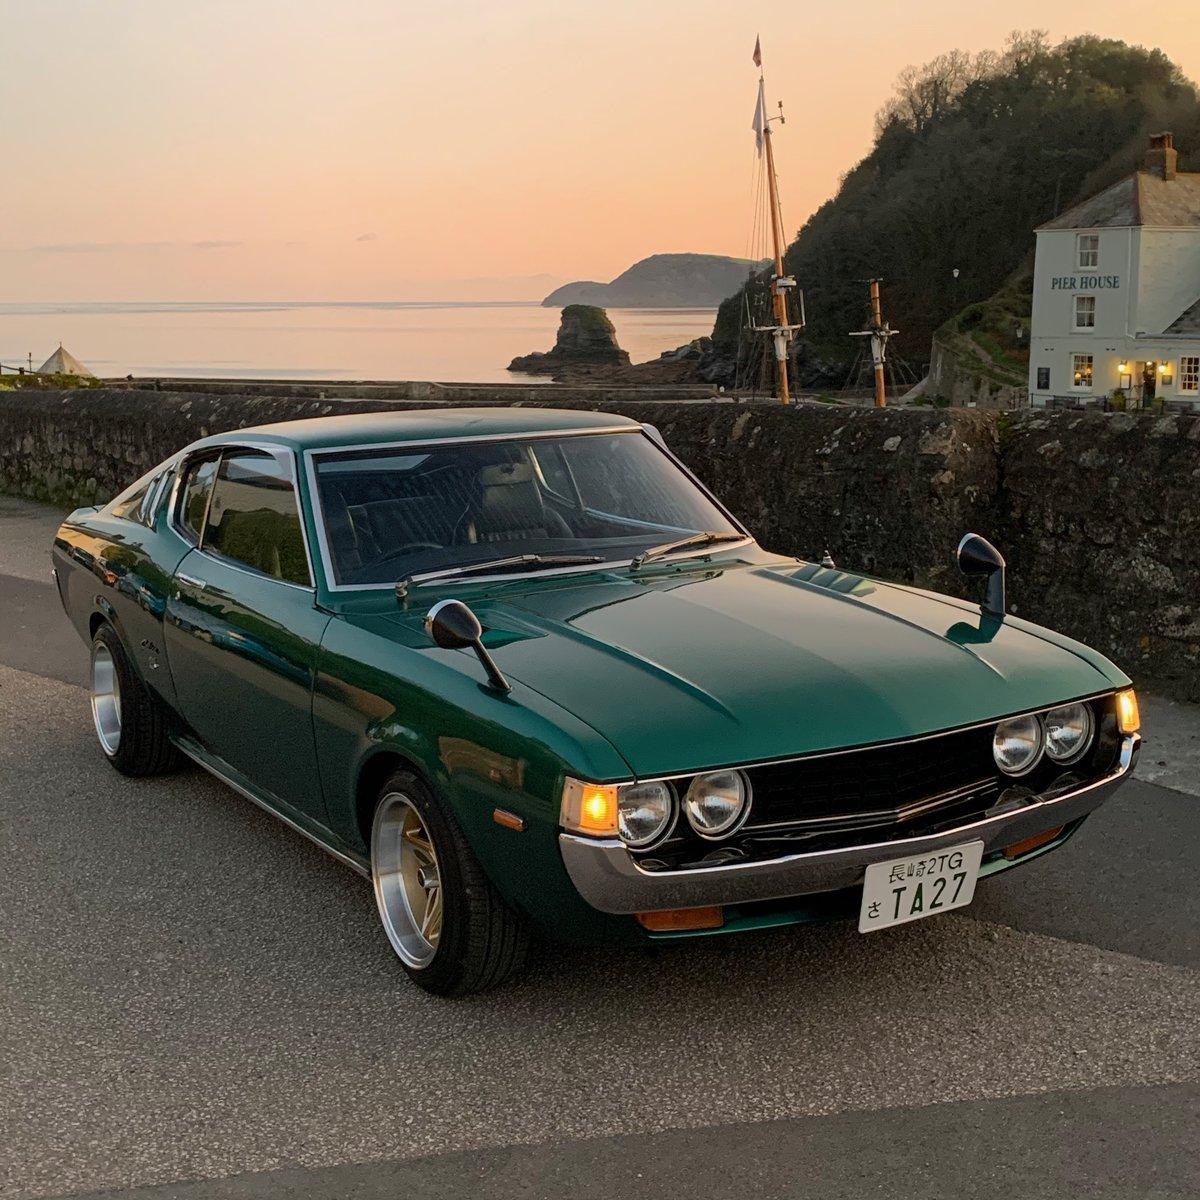 1974 Toyota Celica Liftback 2TG TA27 JDM RA25 TA22  For Sale (picture 2 of 6)